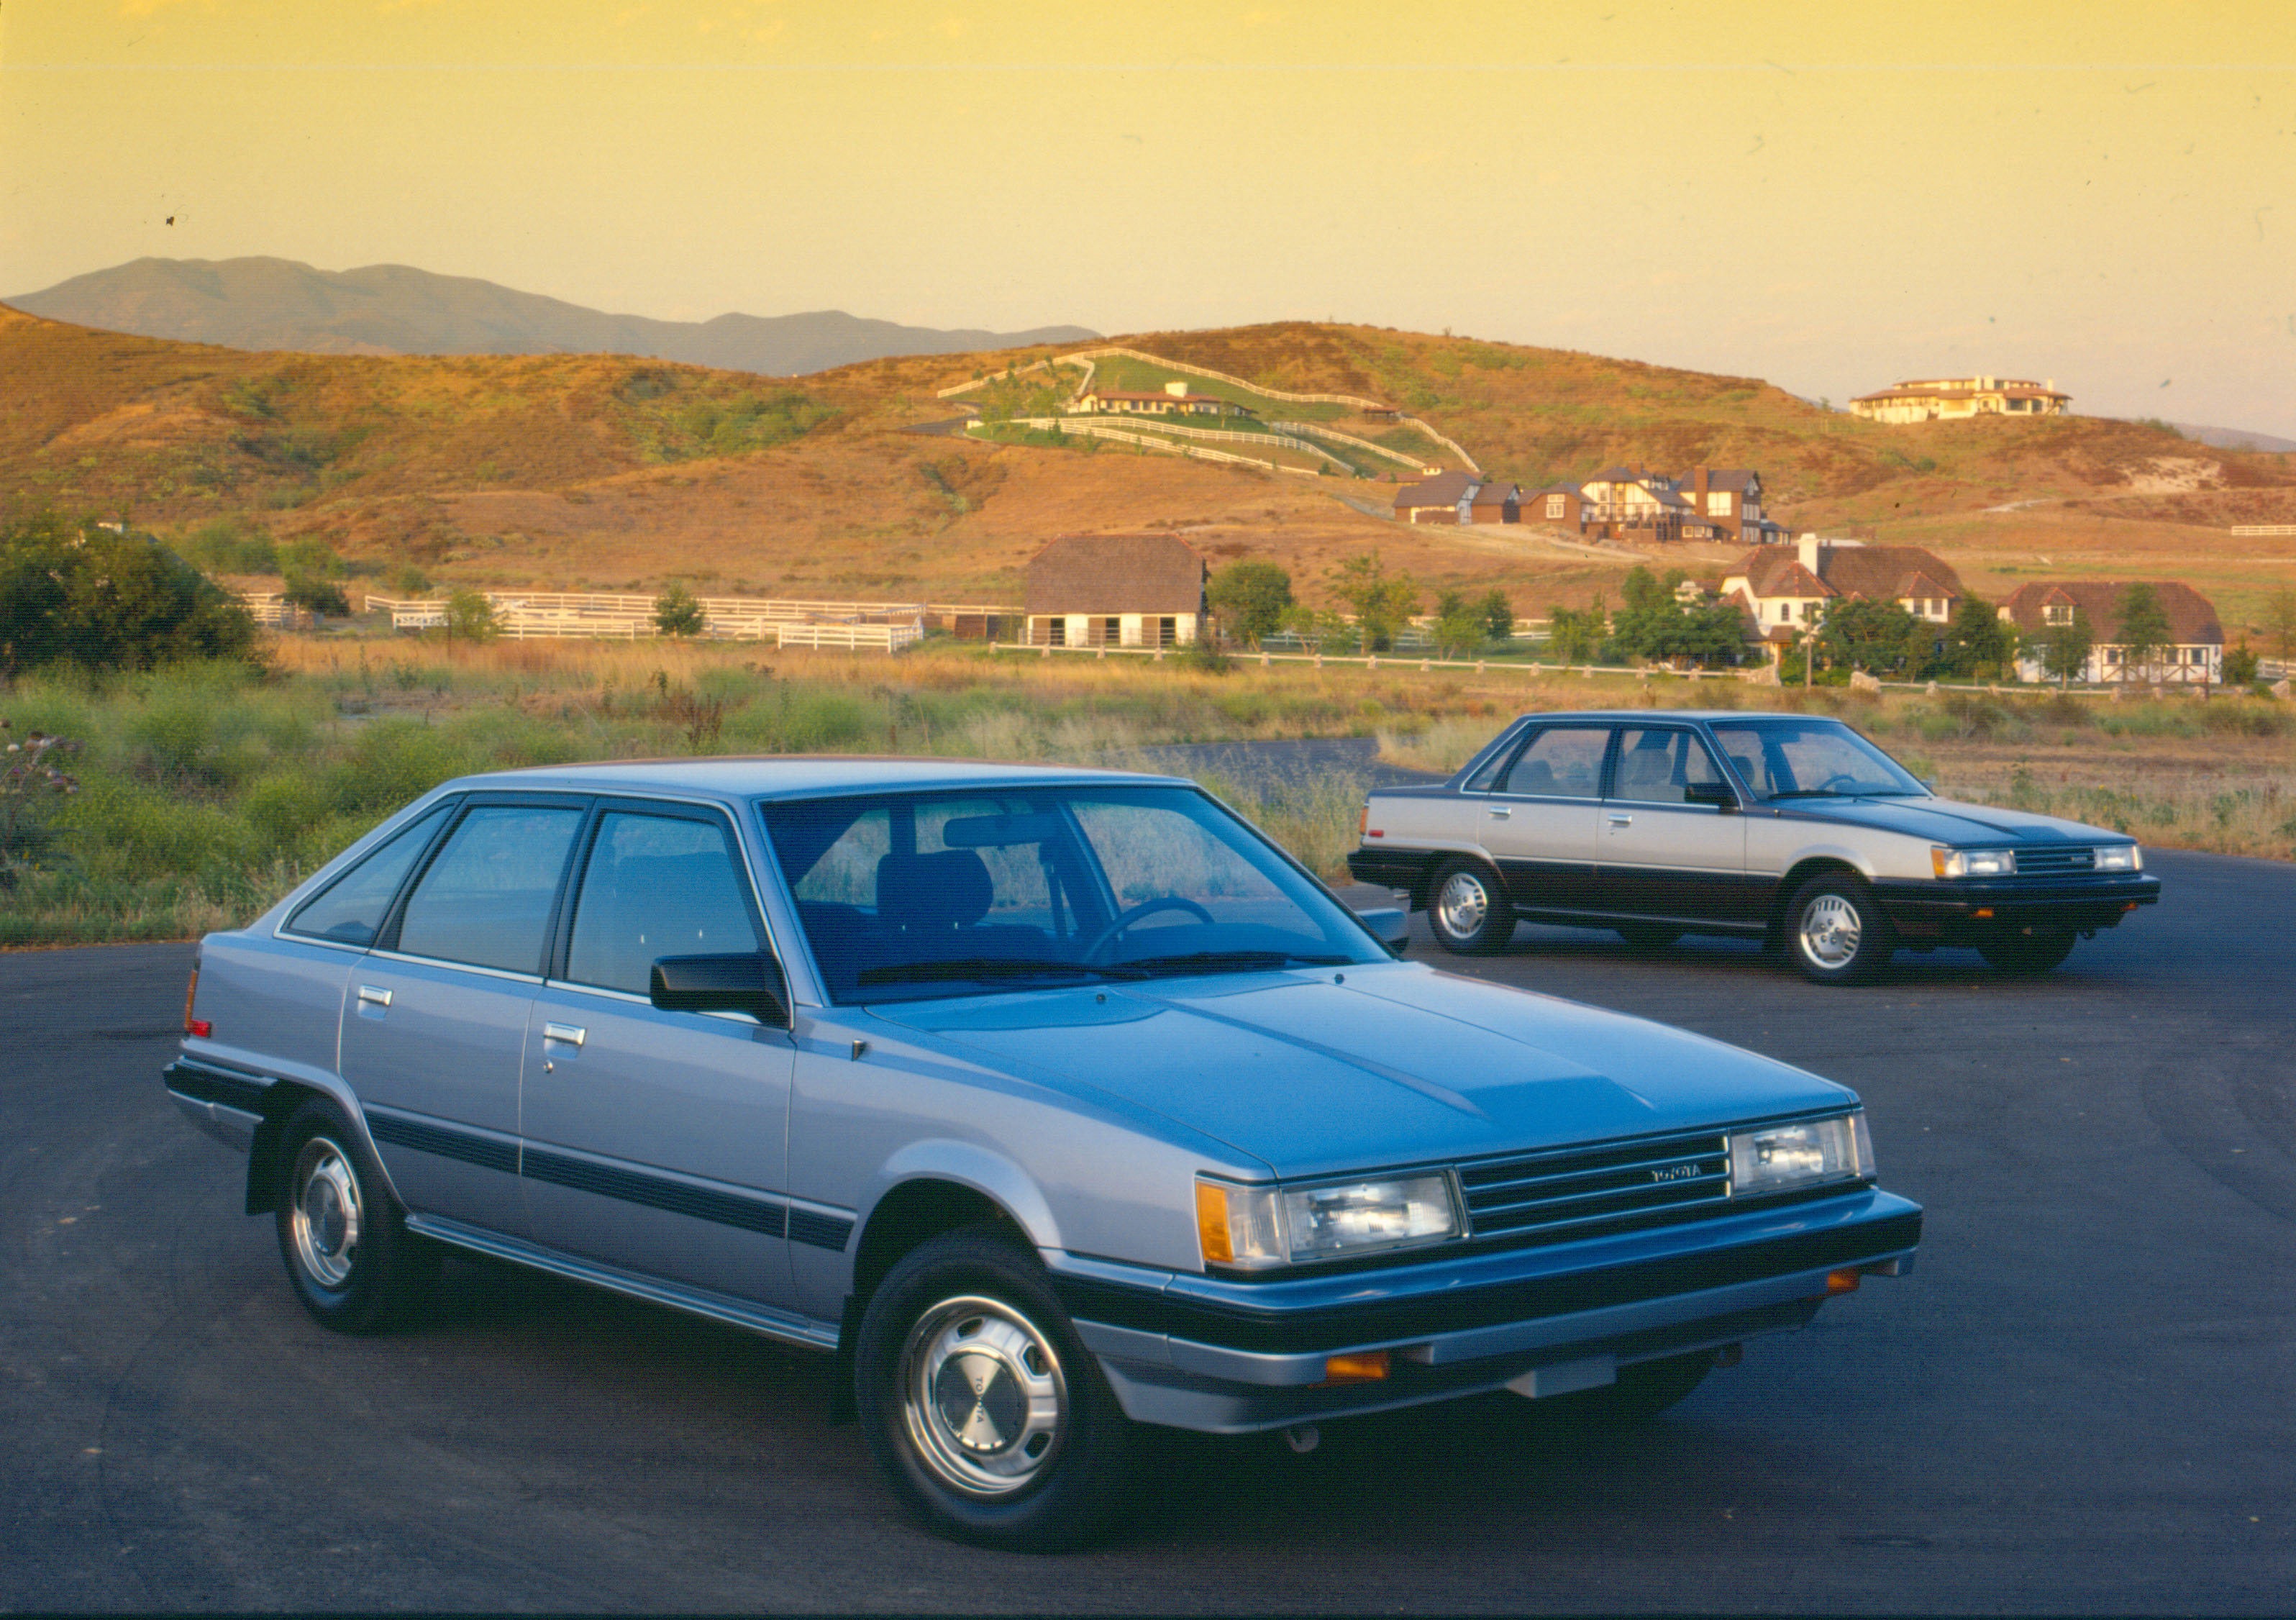 Toyota Camry I (V10) 1983 - 1986 Liftback #1